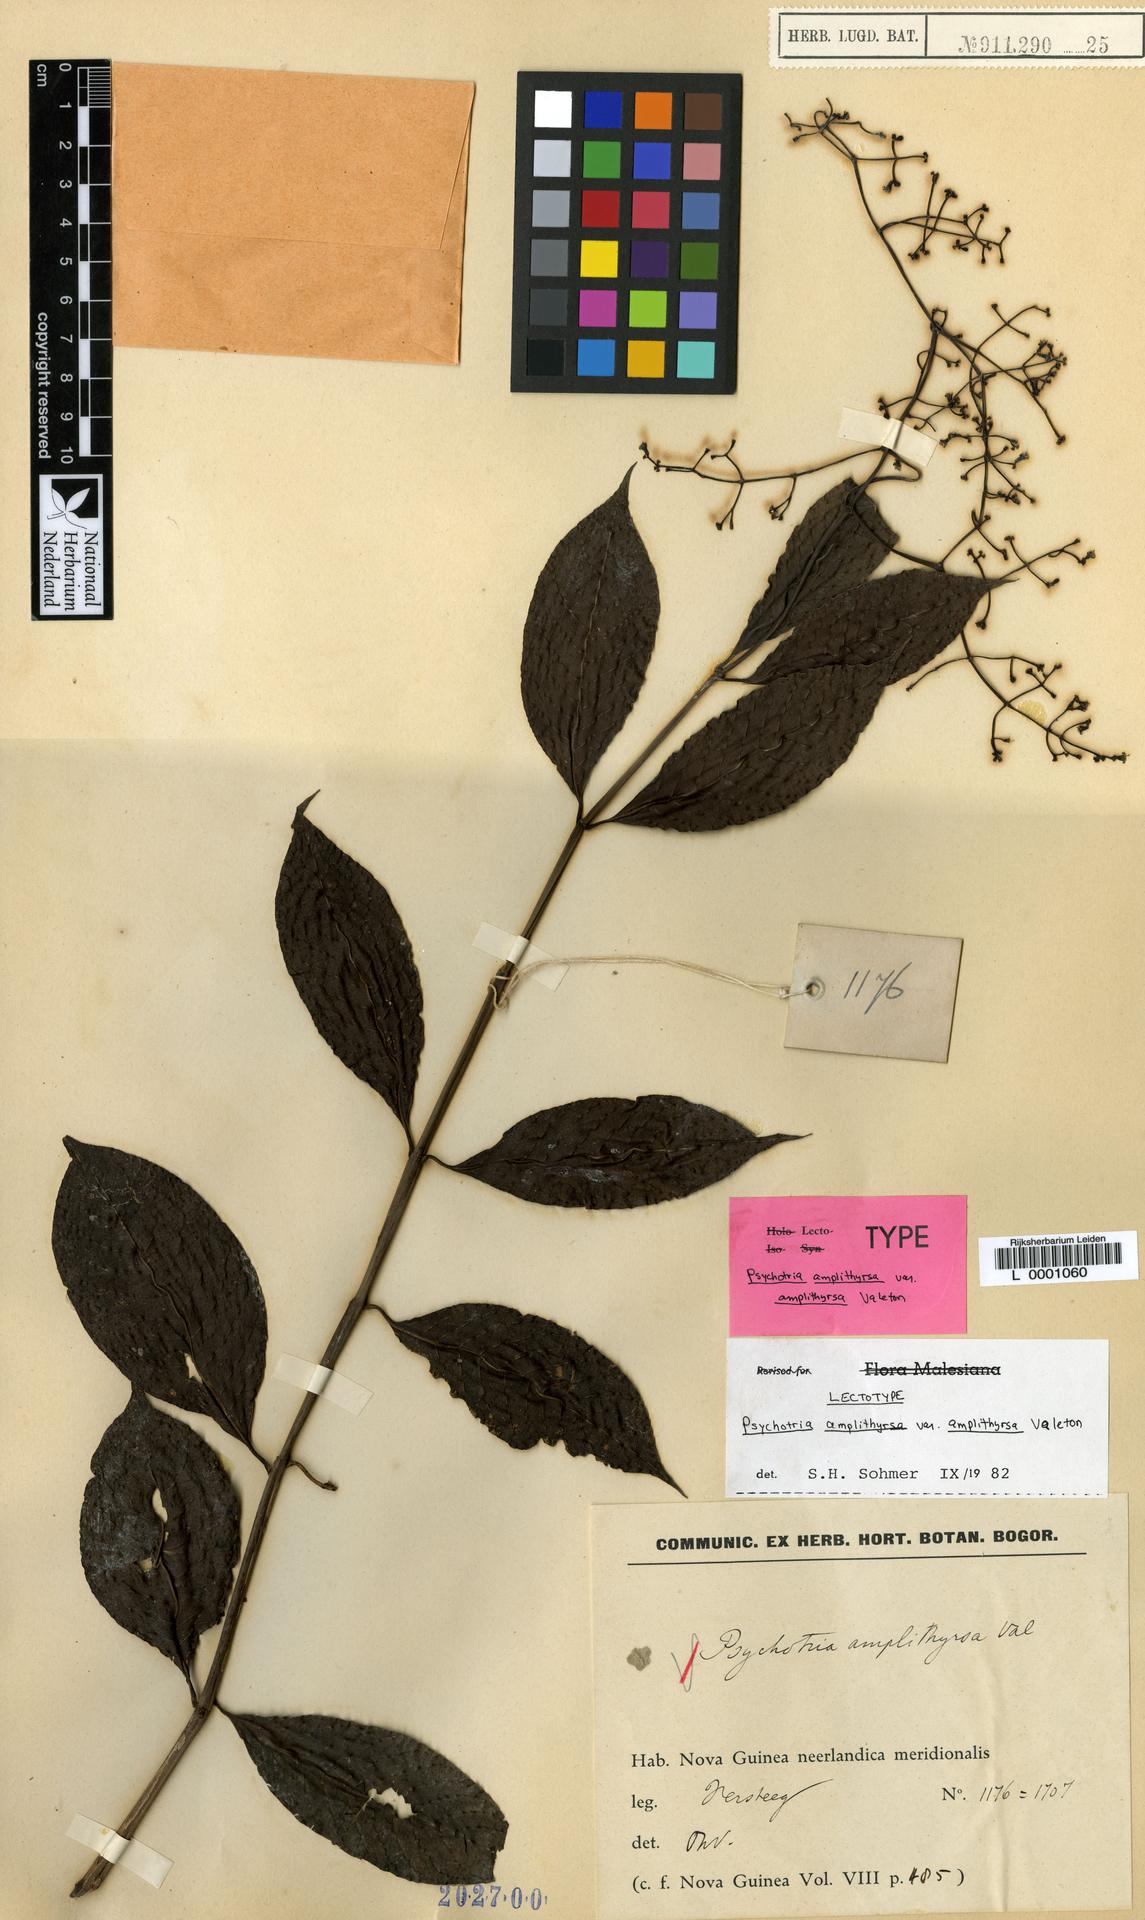 L  0001060 | Psychotria amplithyrsa var. amplithyrsa Valeton